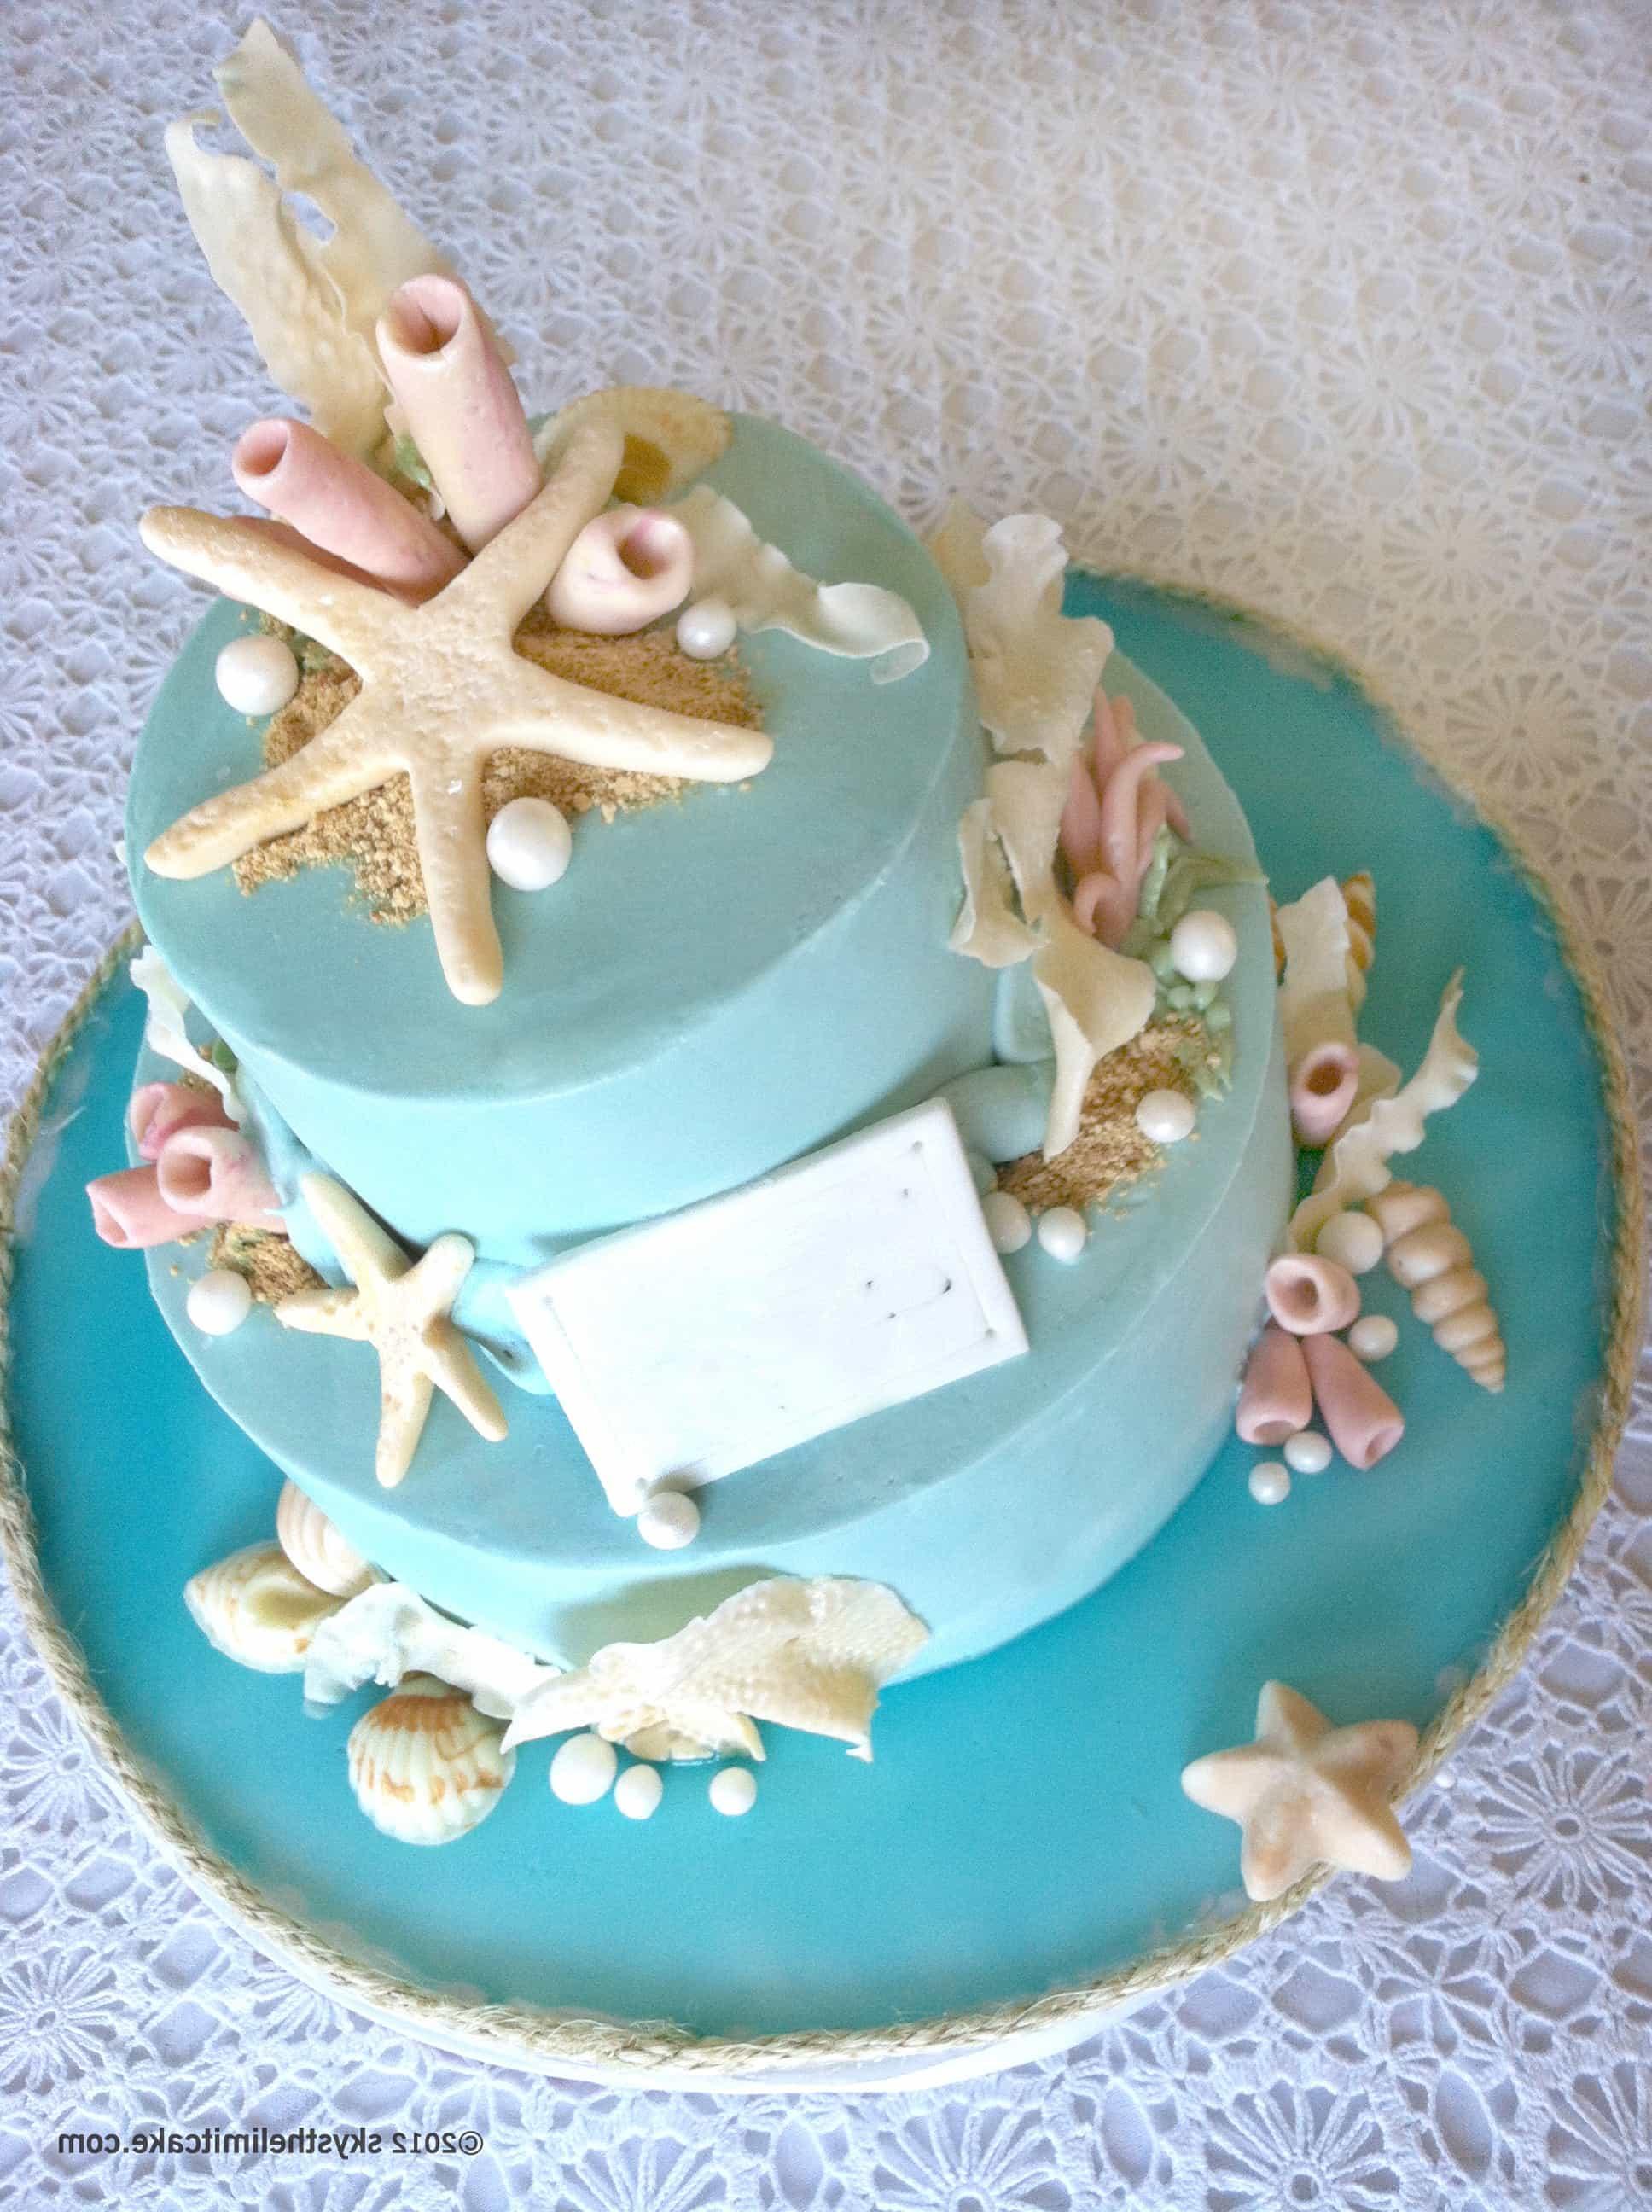 Beach Theme Seaside Wedding Cakes (Image 3 of 13)